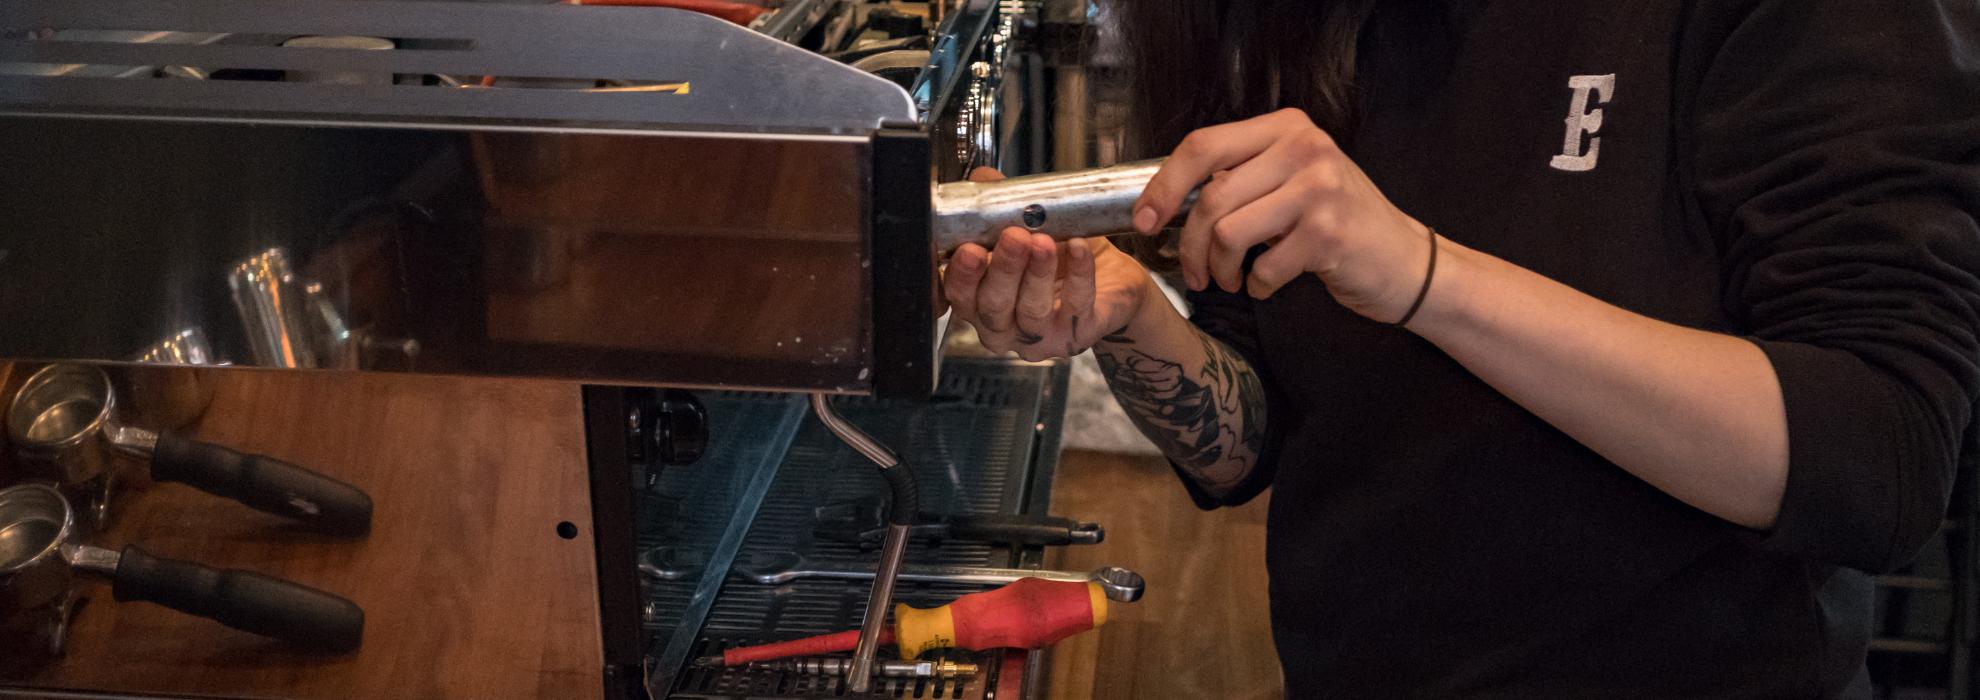 Extract Coffee Roasters Engineer Repairing a machine